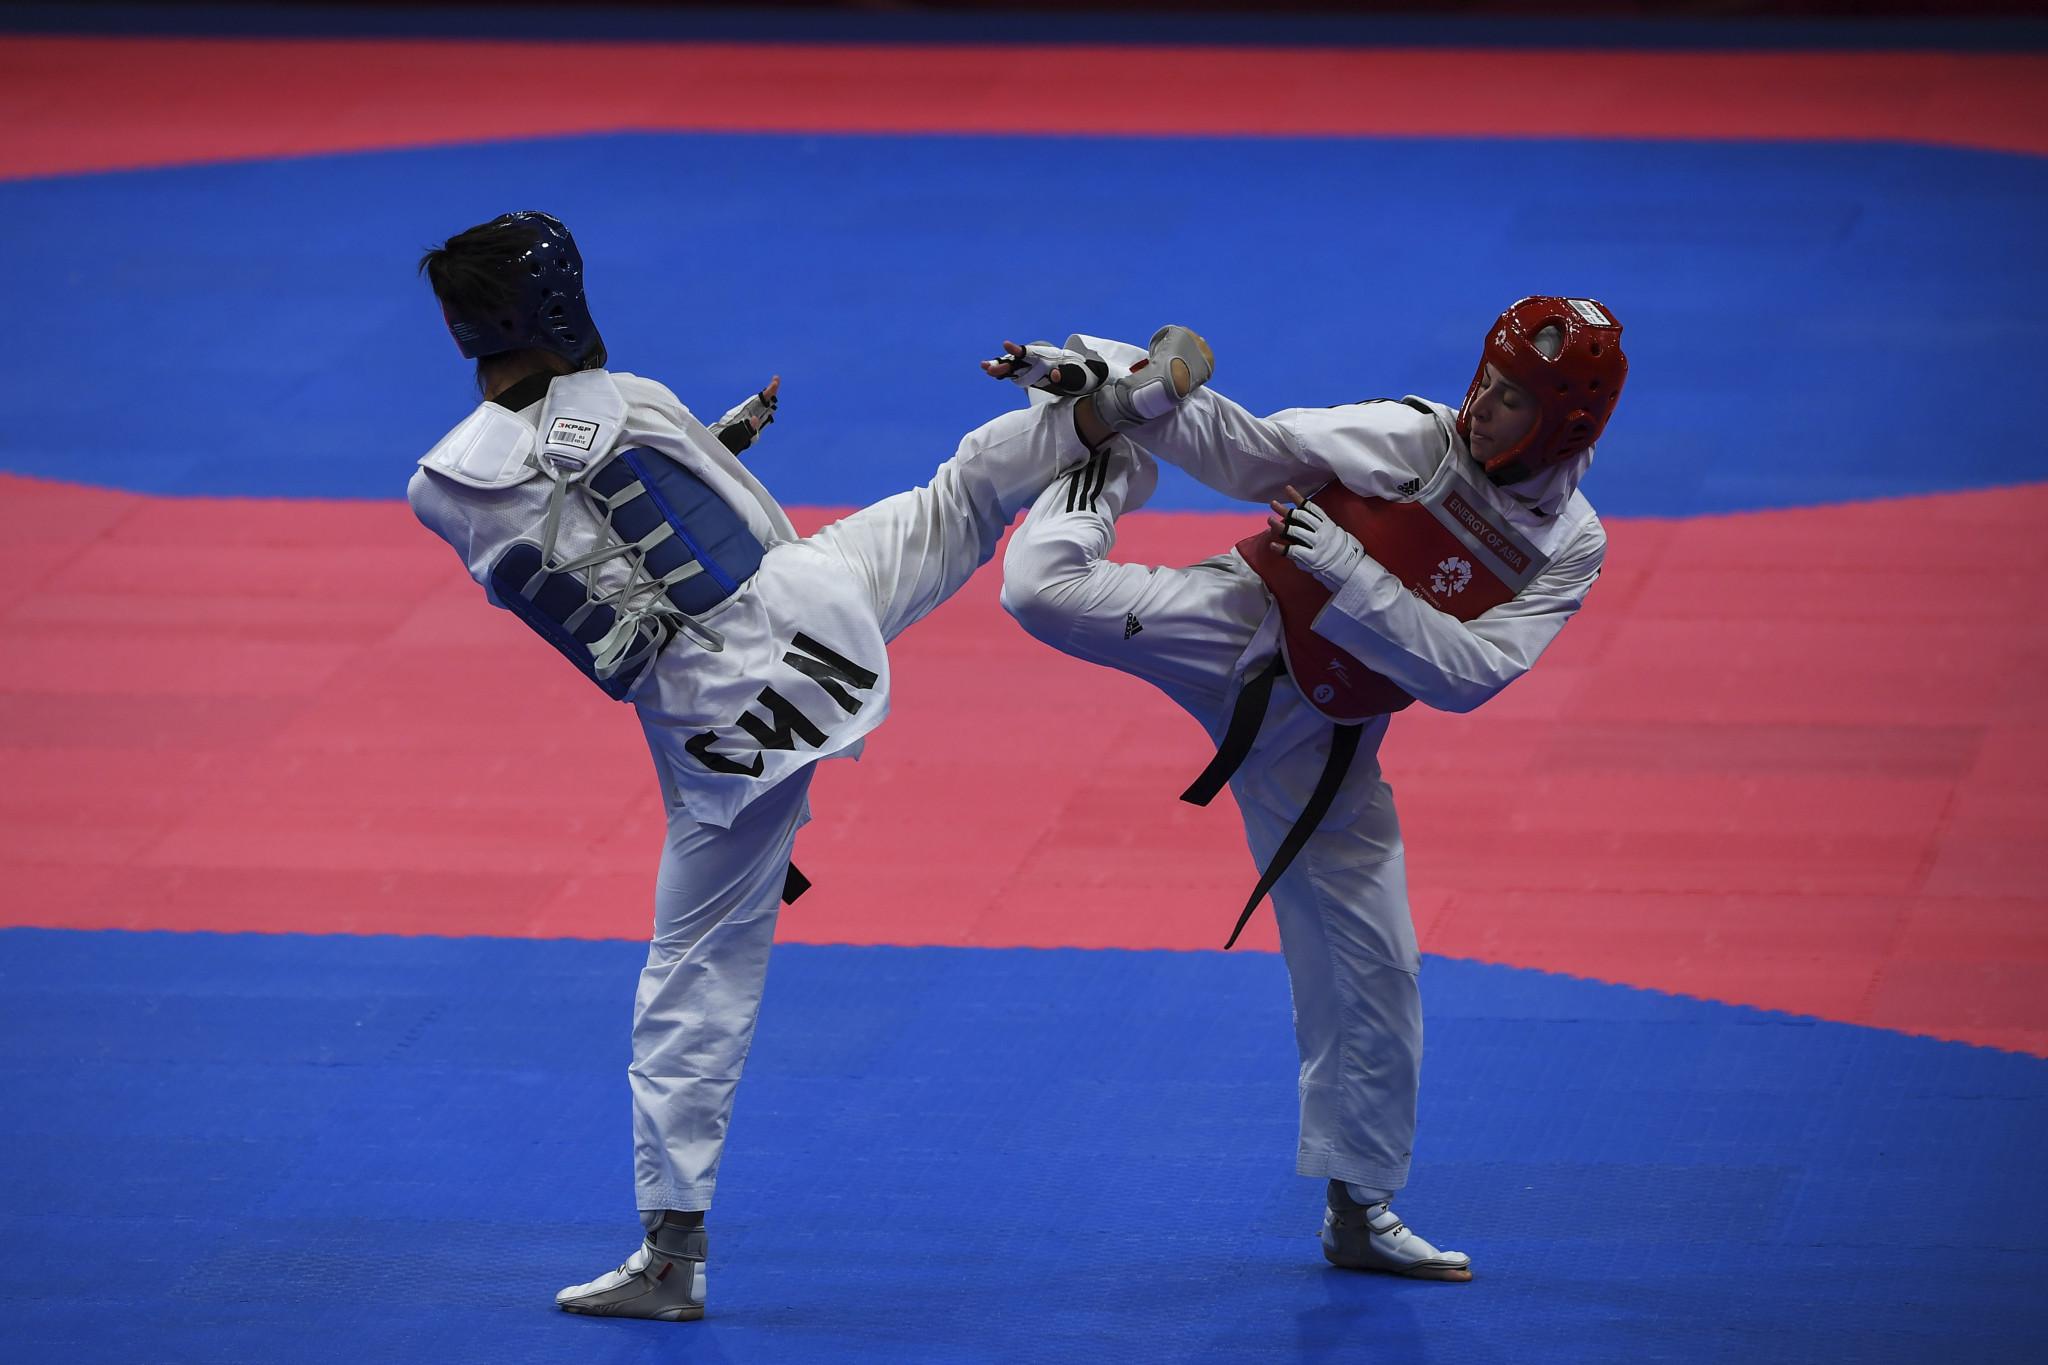 Chinese Taipei qualify three athletes as hosts Jordan enjoy good day at Asian Olympic taekwondo qualifier